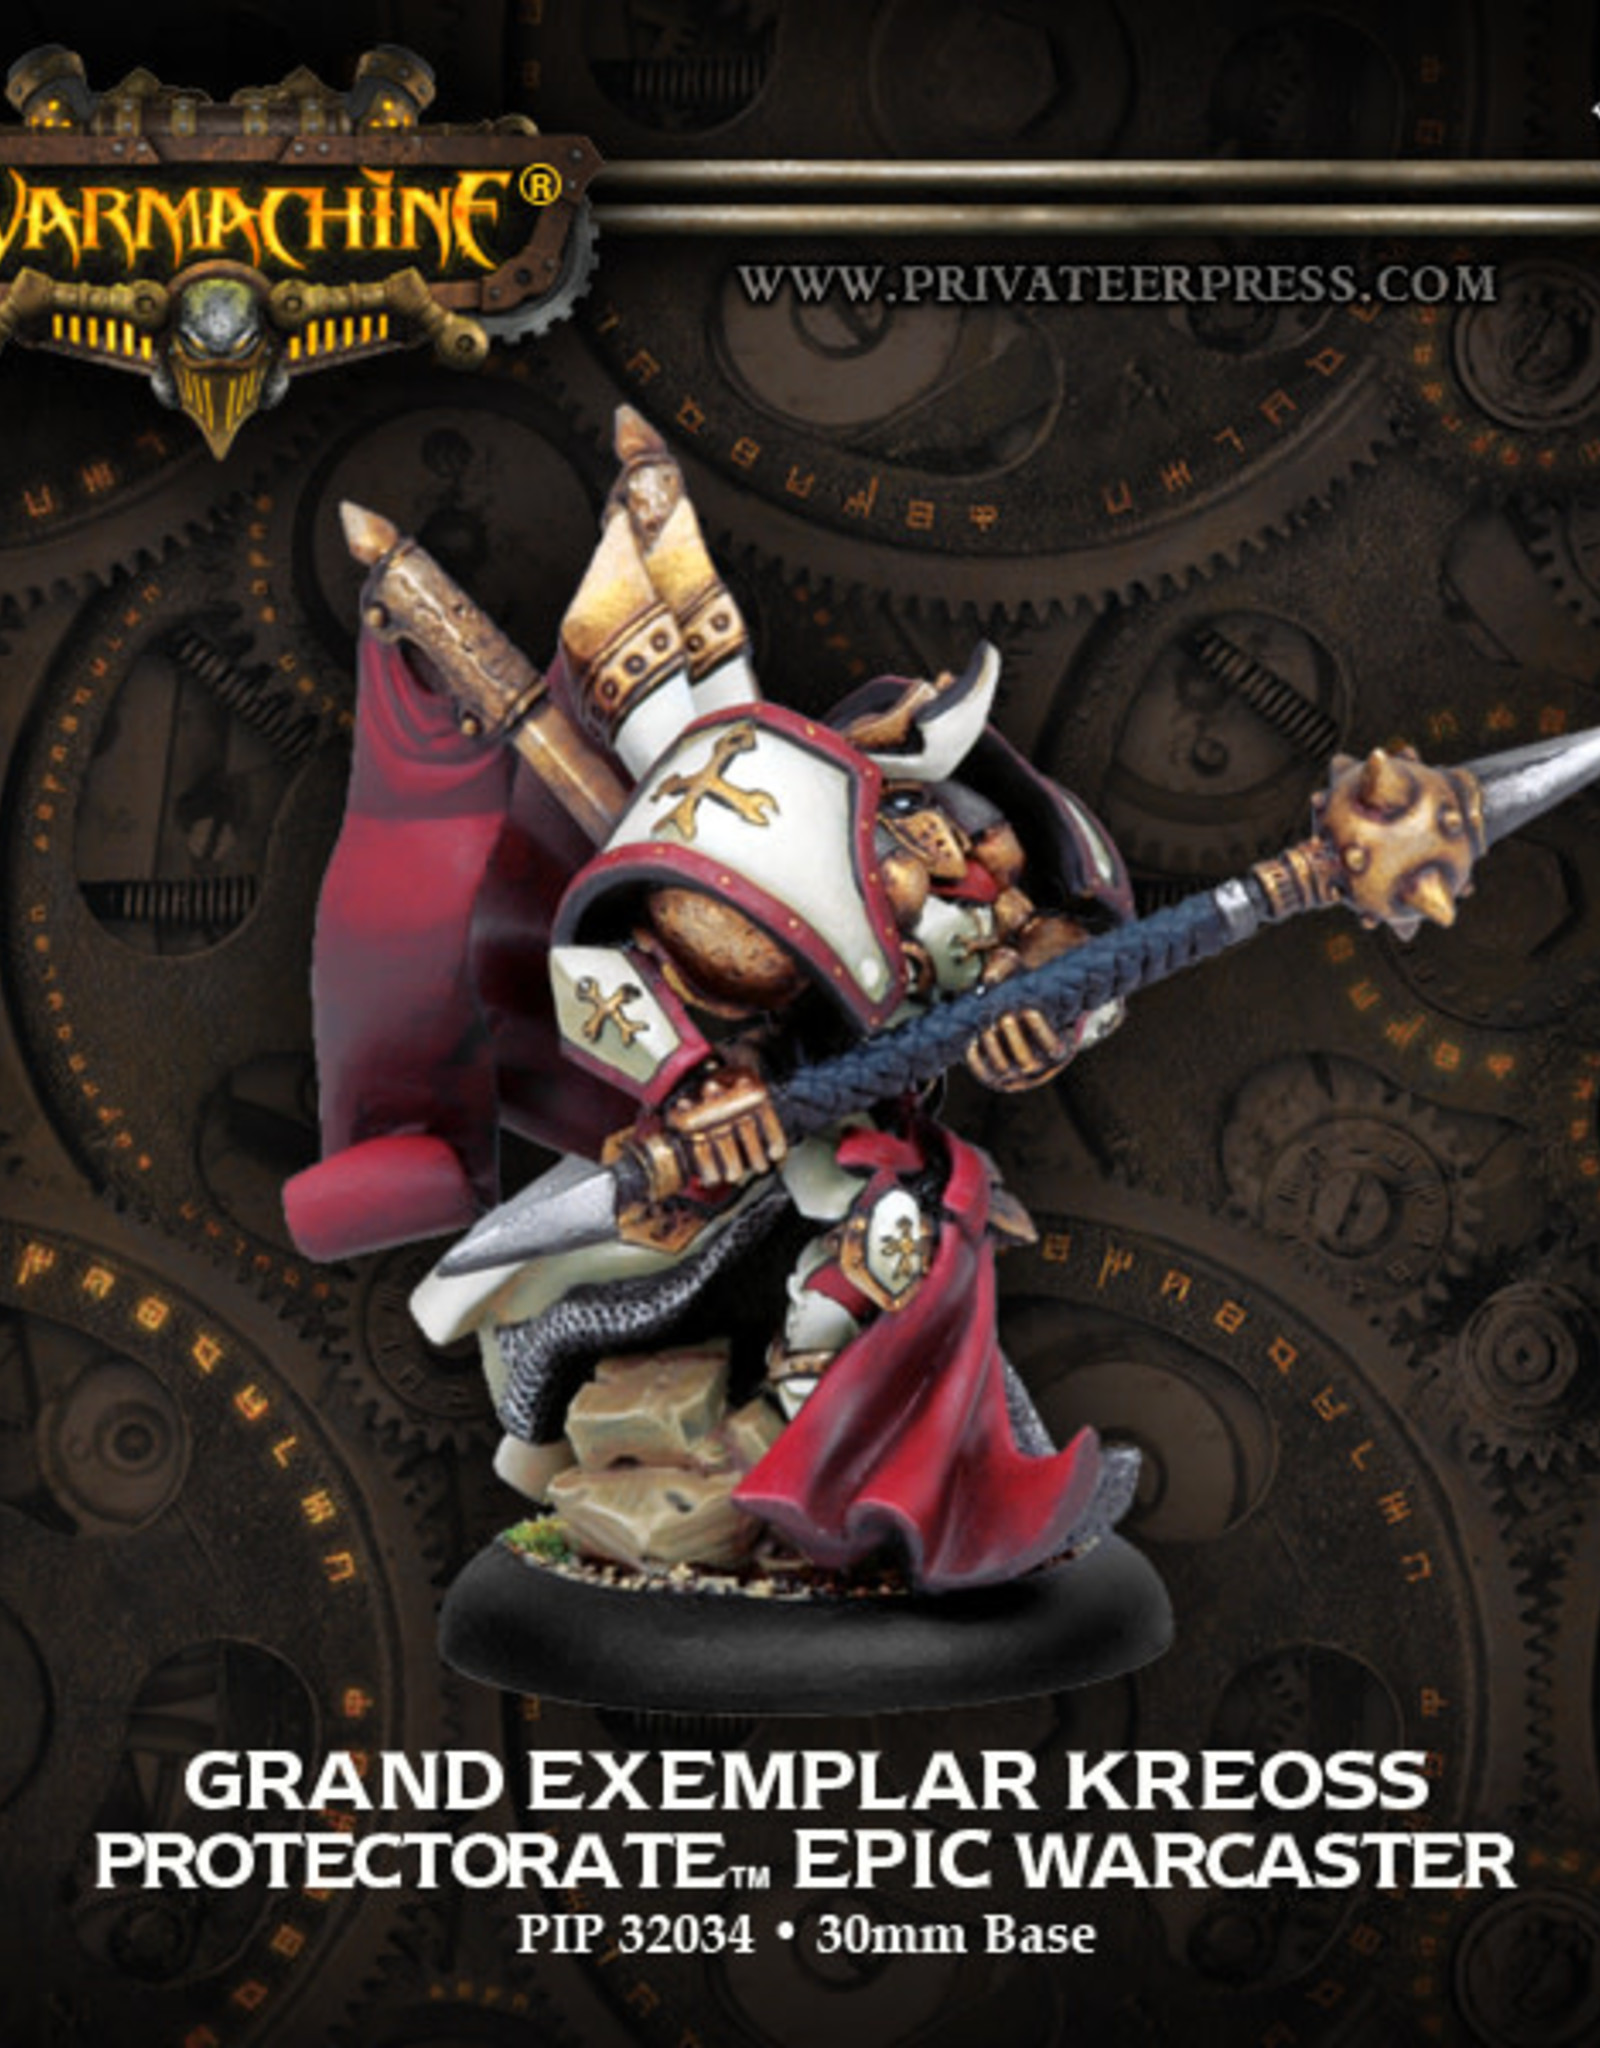 Warmachine Protectorate - Grand Kreoss